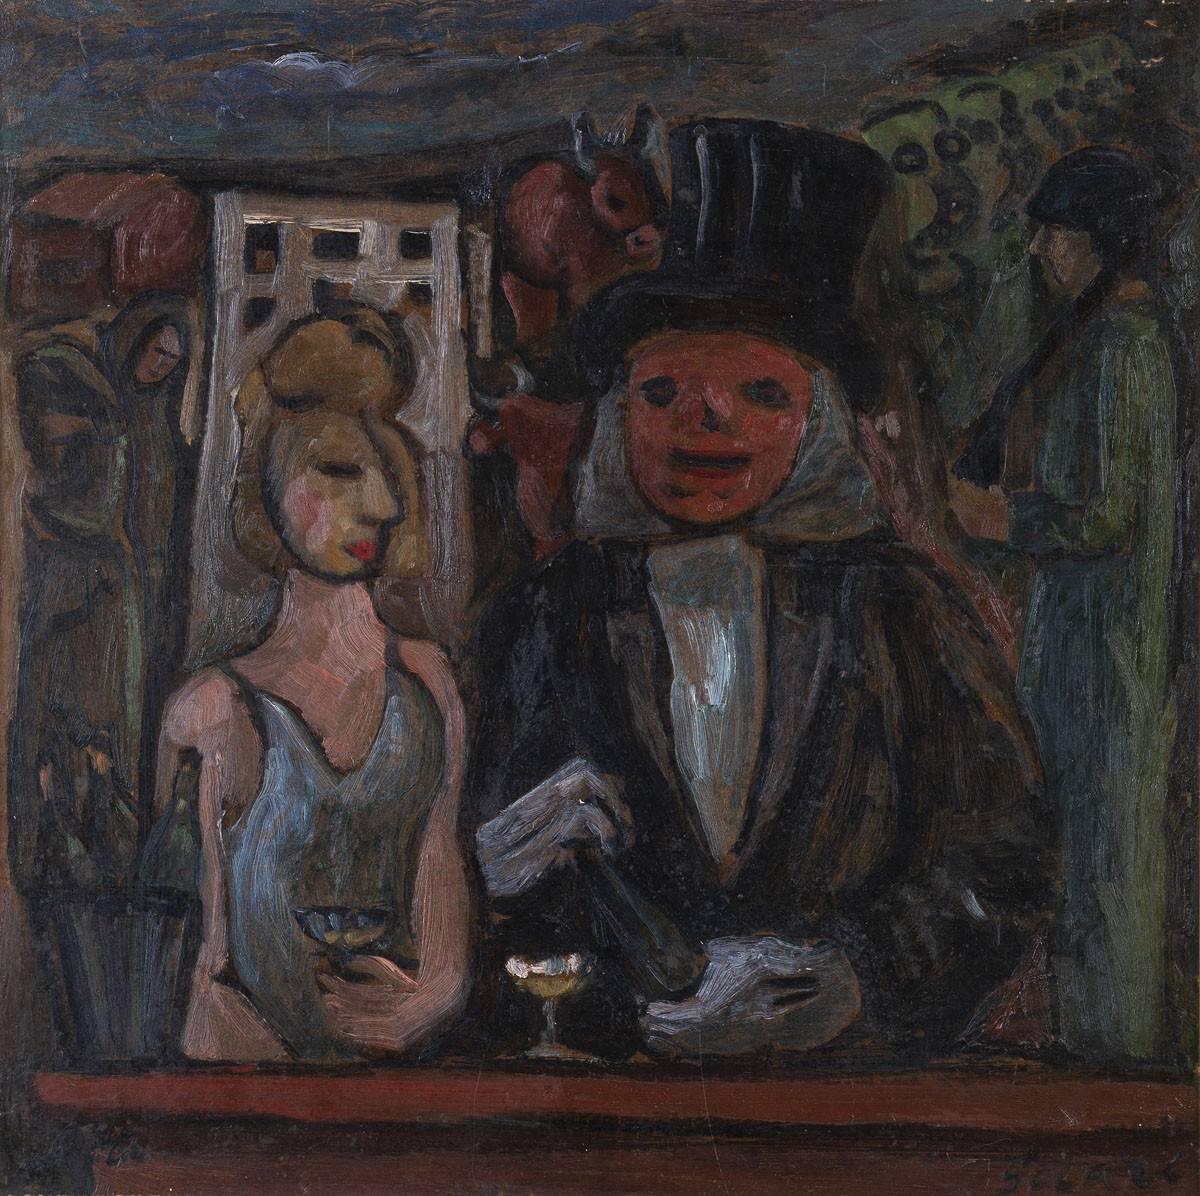 Obra ampliada: La cena - Luis A. Solari